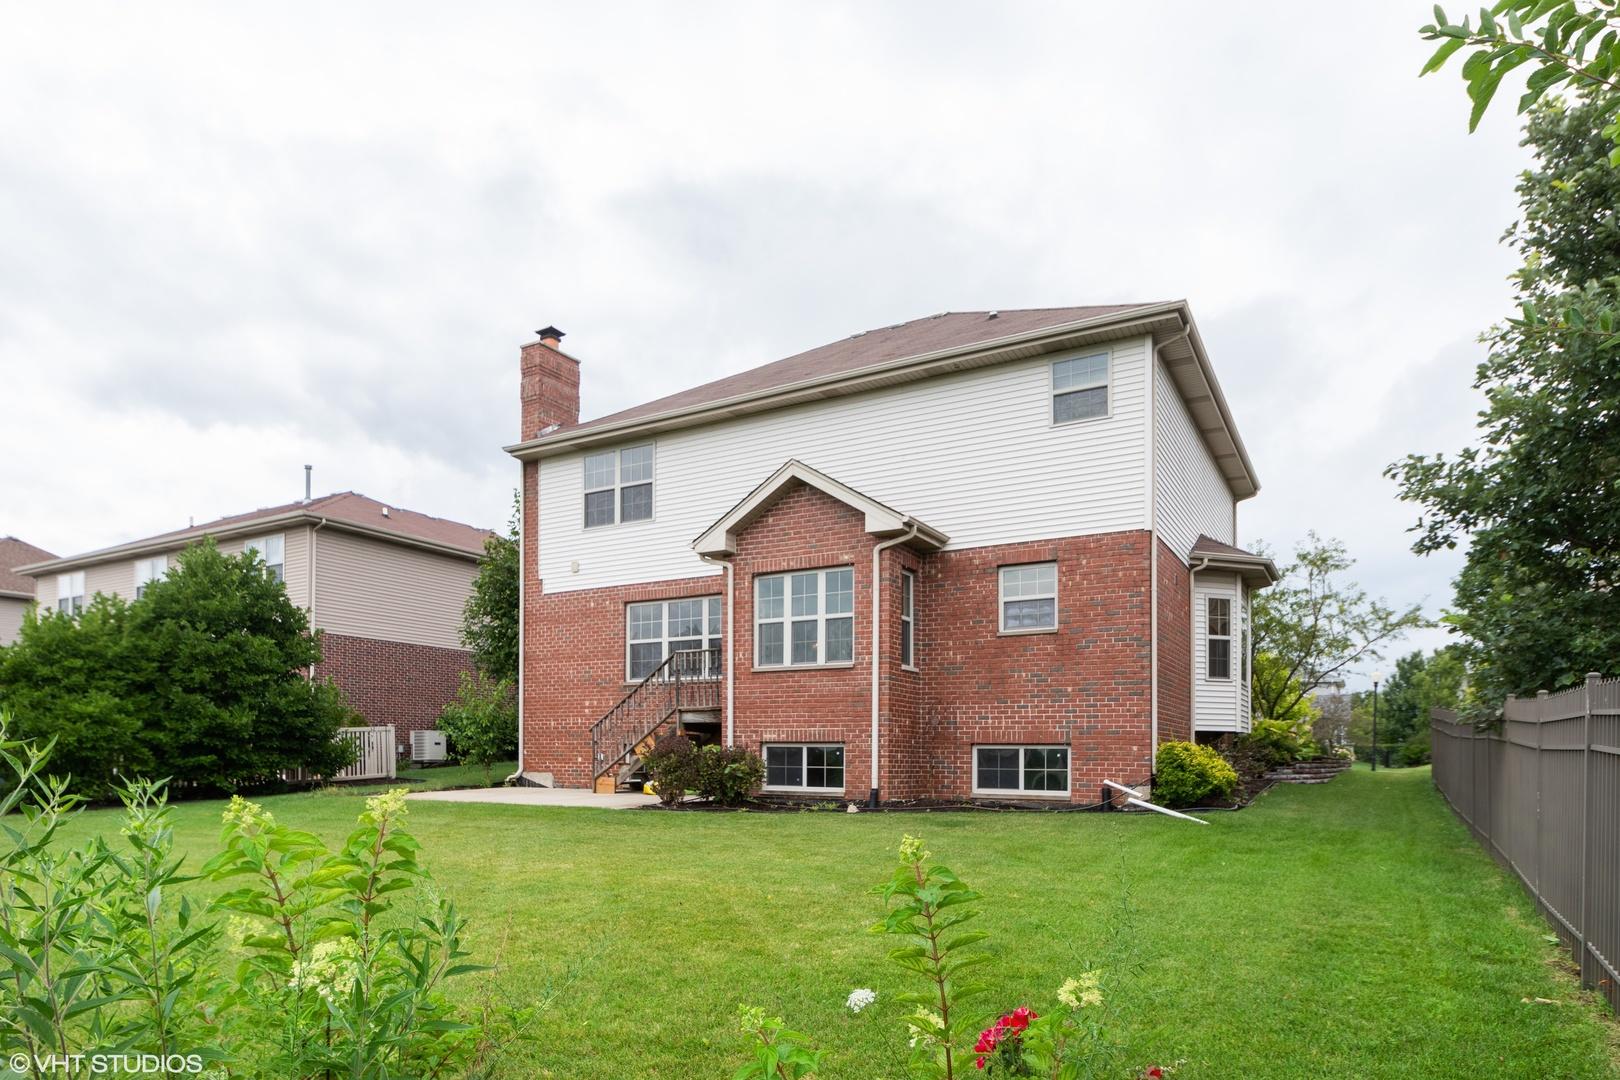 8107 West Rosebury, Frankfort, Illinois, 60423